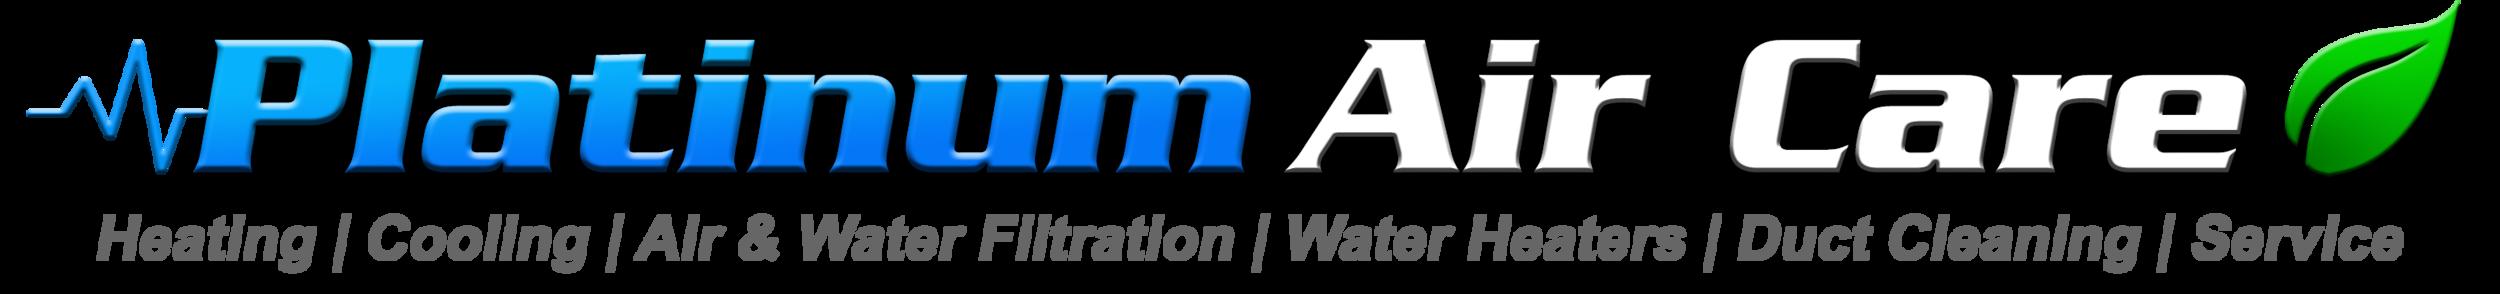 Platinum Air Care Logo - White.png